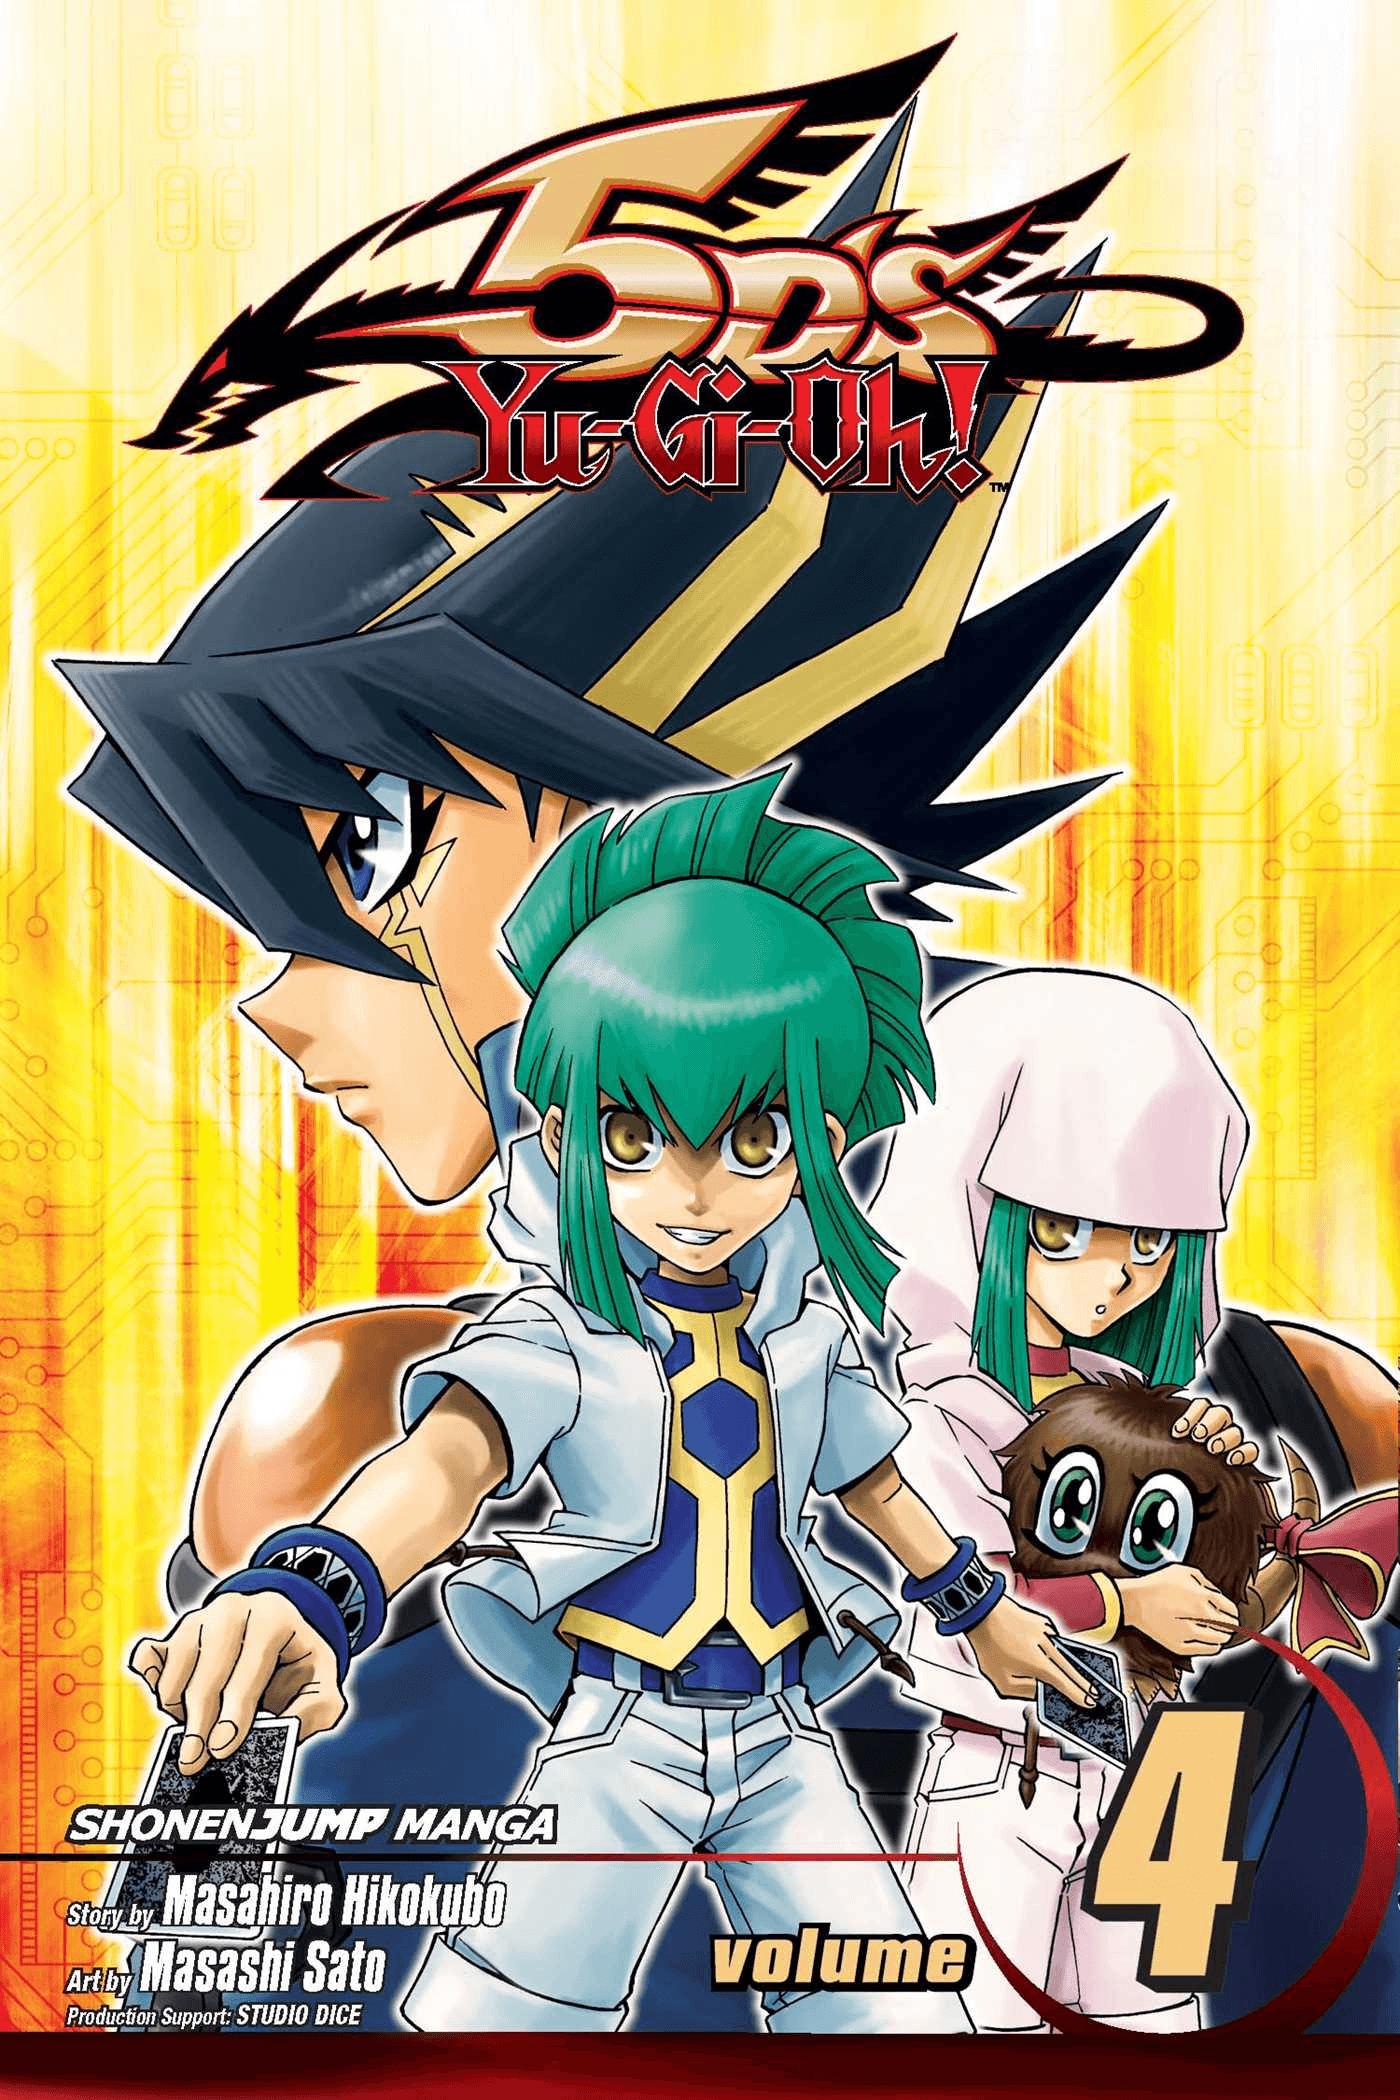 Yu-Gi-Oh! 5d'S Rollen